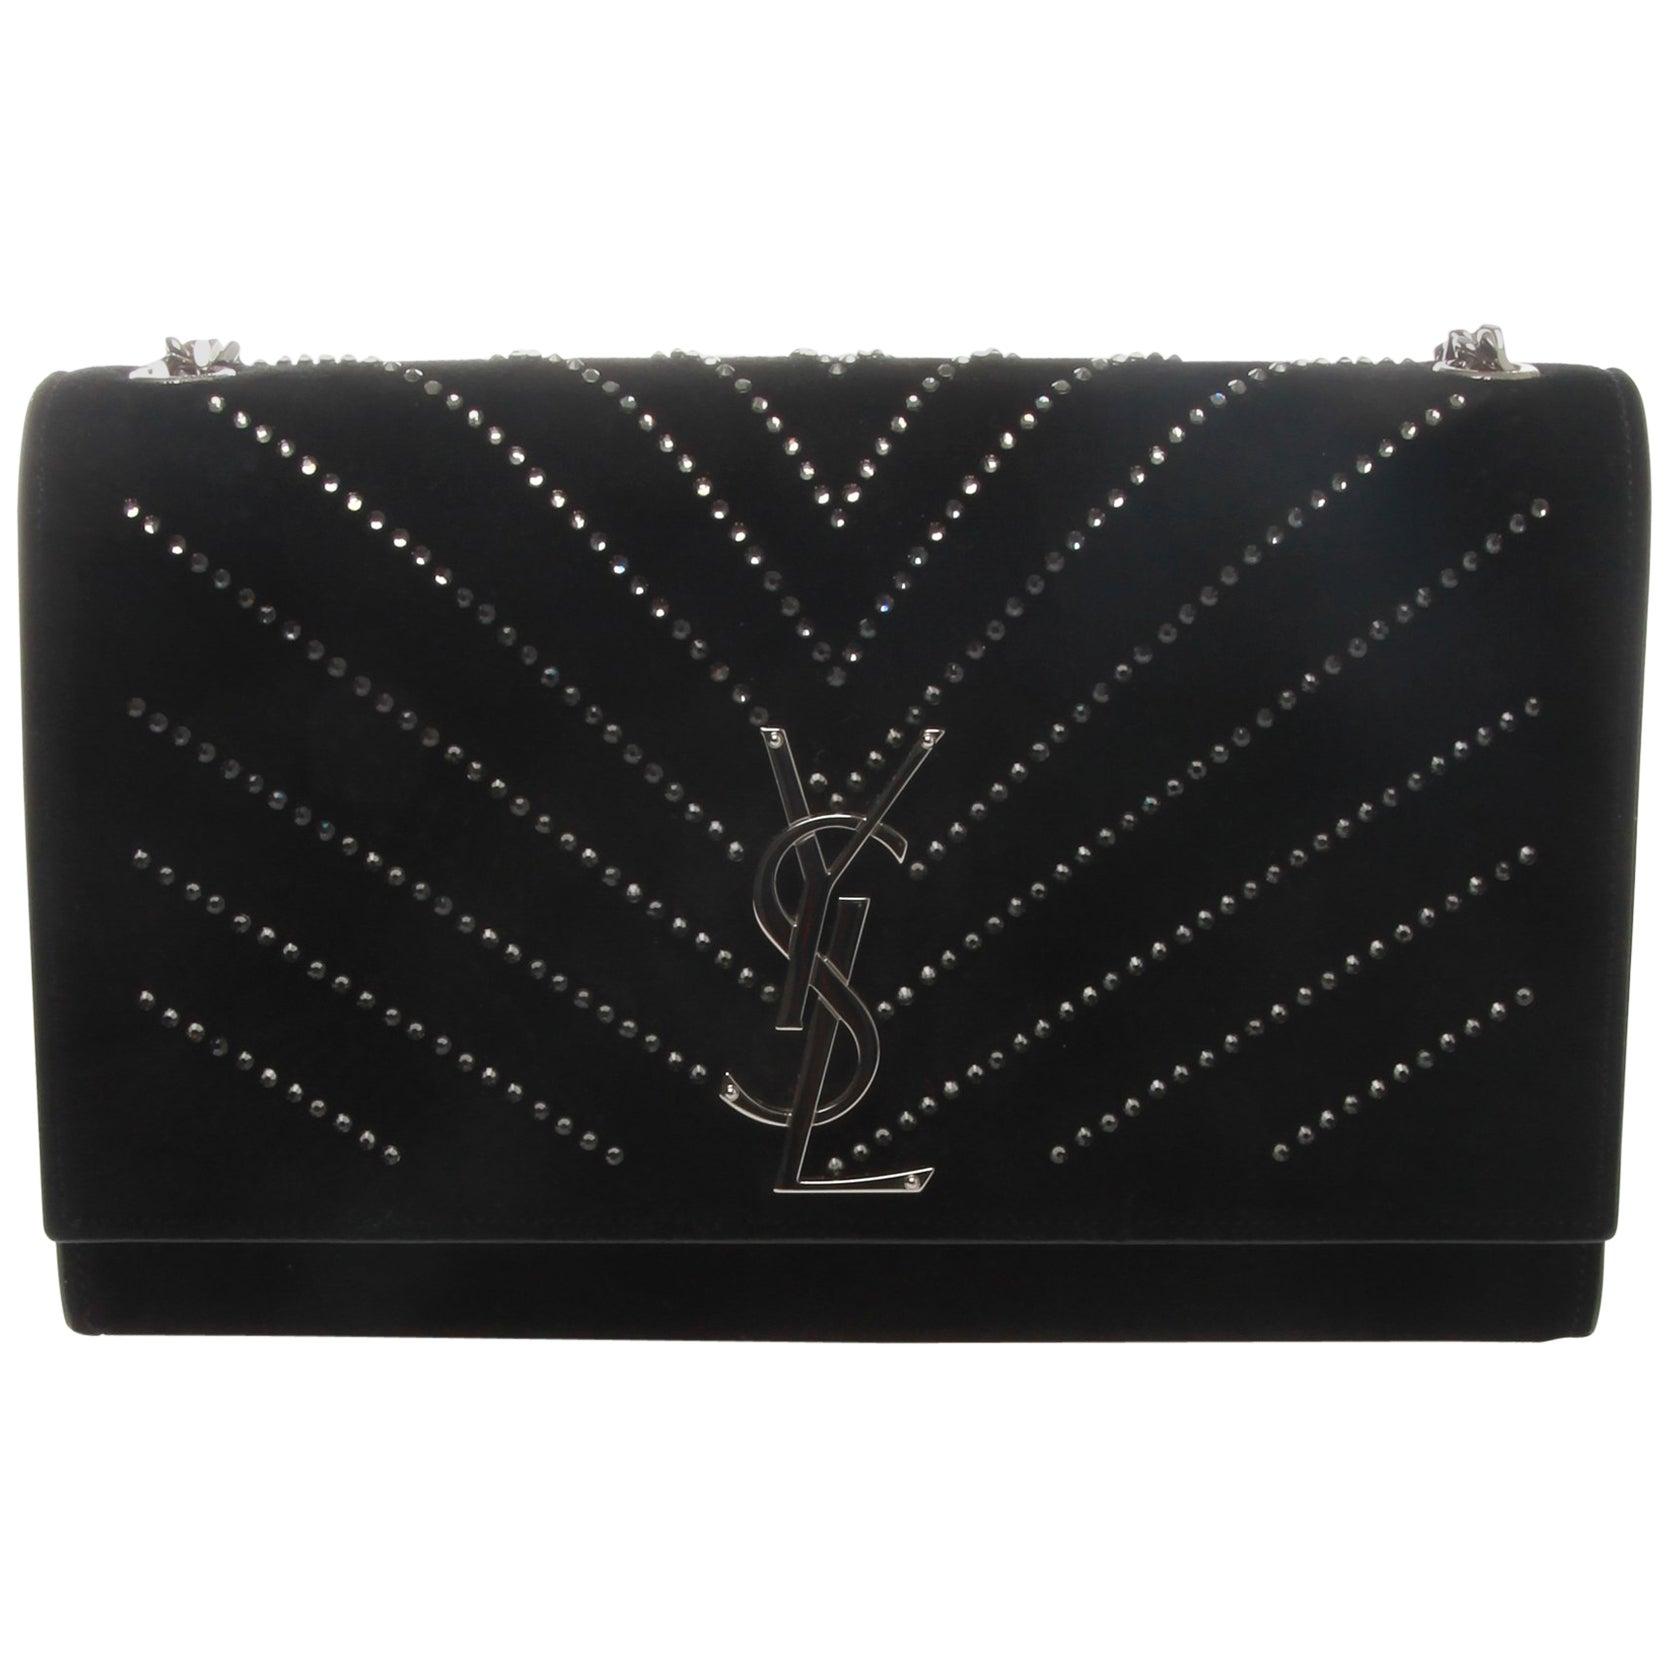 Saint Laurent YSL Black Embellished Classic Kate Crossbody Bag at 1stdibs b7ae48c754